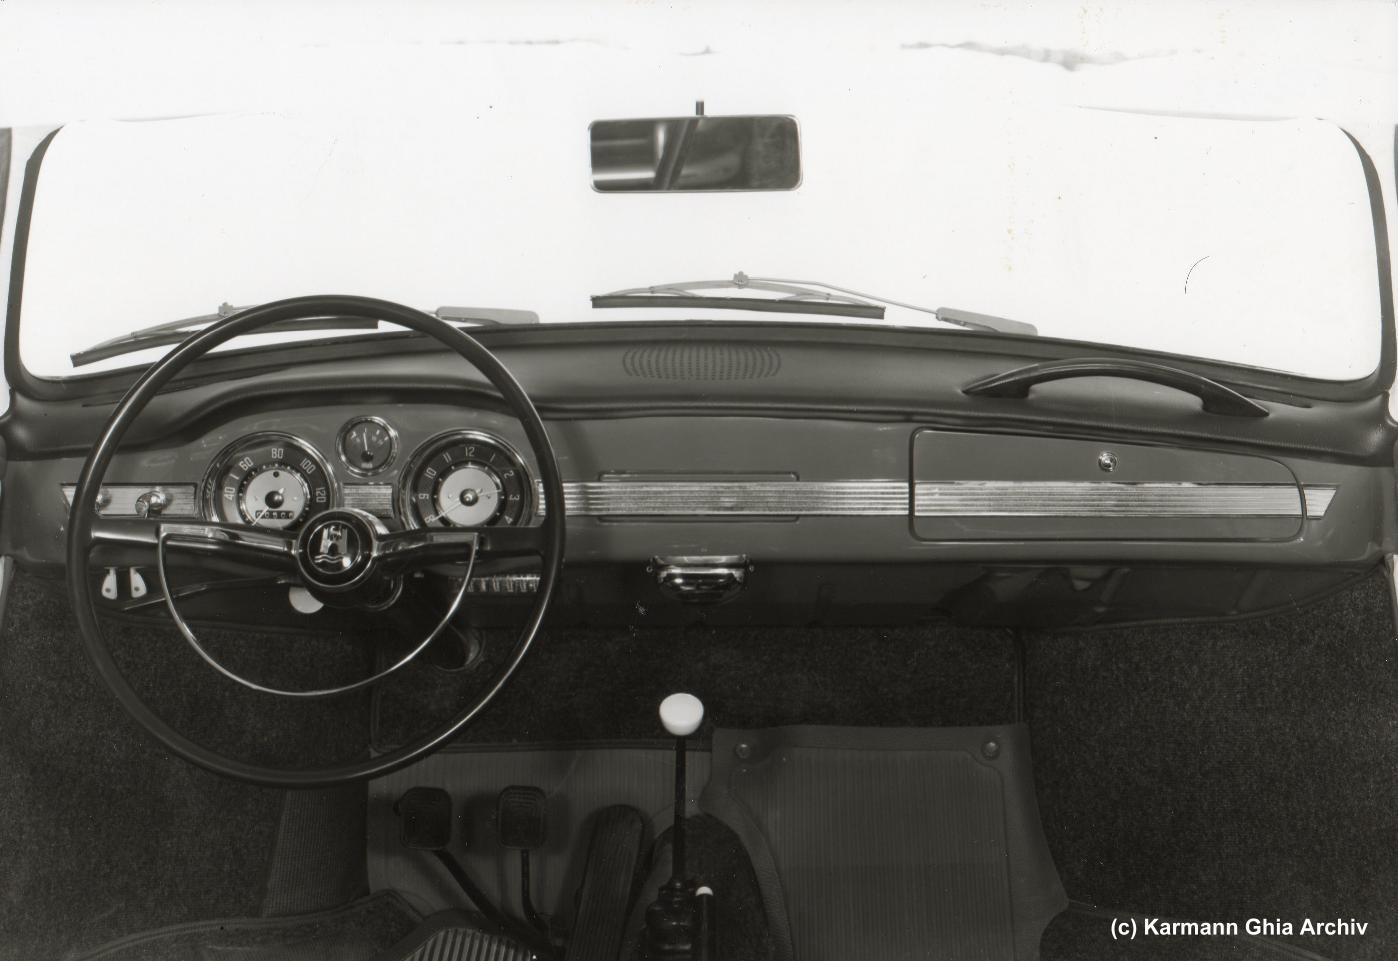 TheSambacom  Ghia  View topic  1966 Ghia  Interior Trim